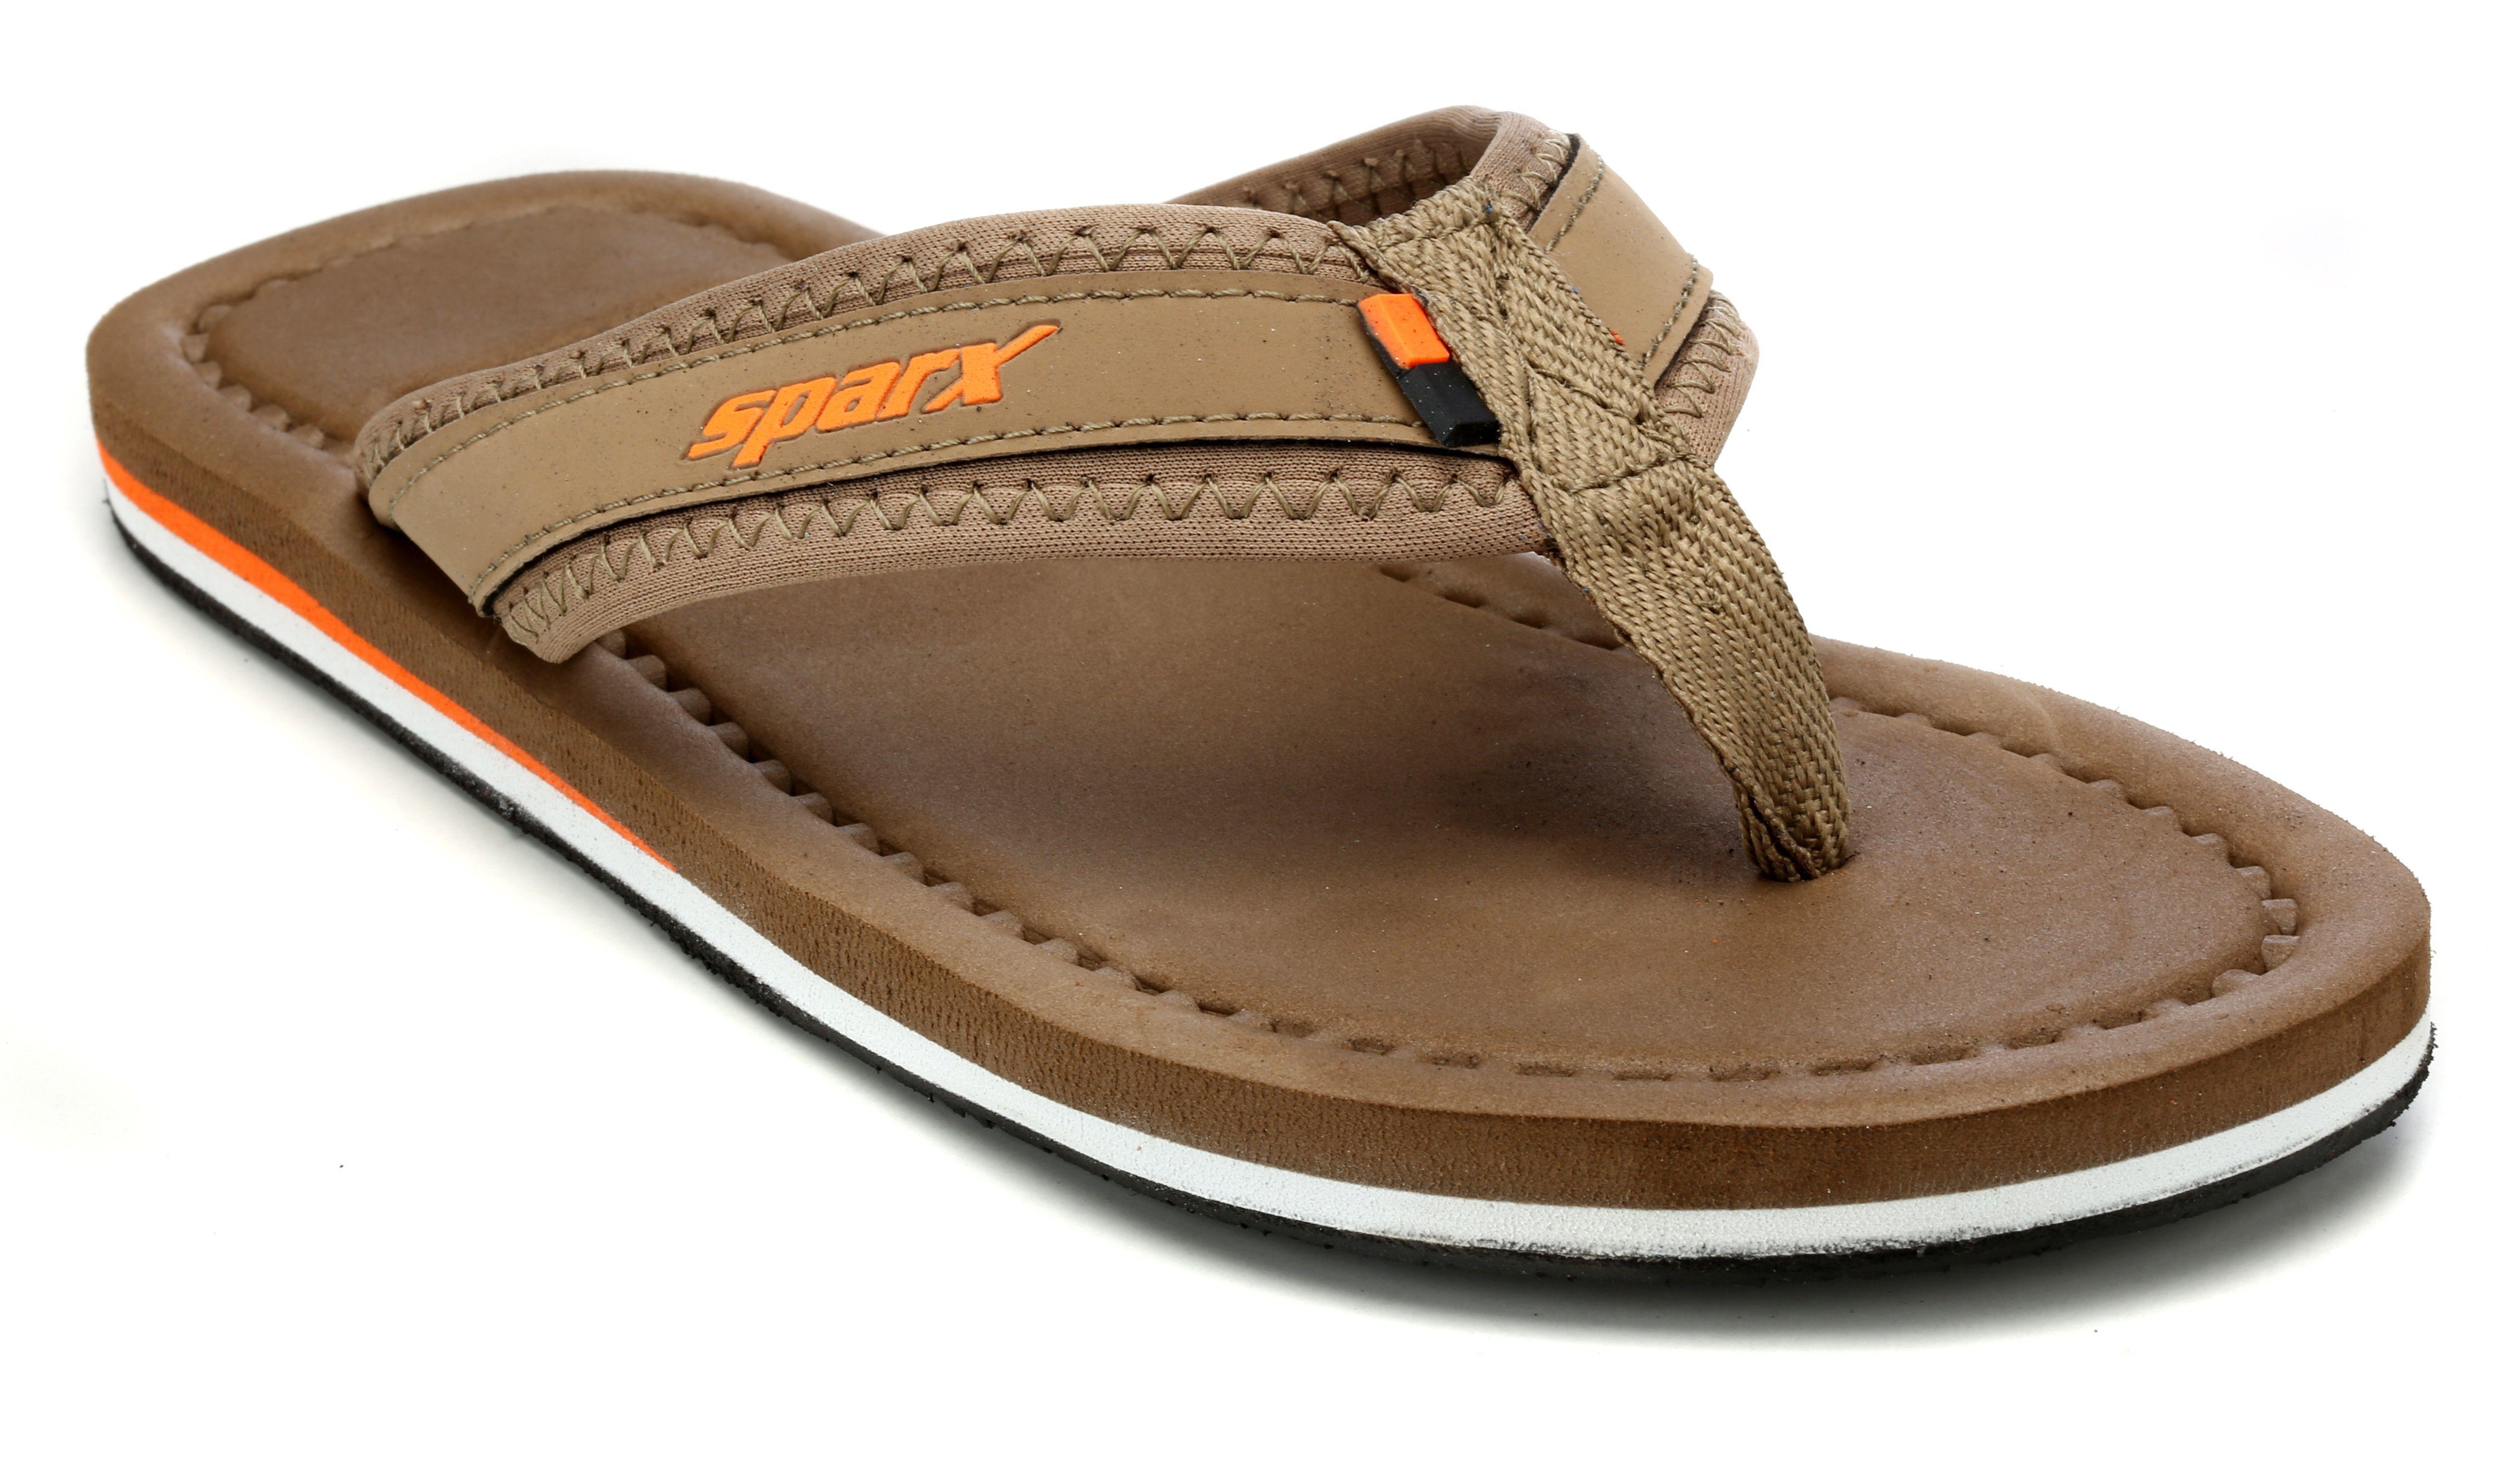 a112aa0d5 Sparx Men SFG-48 Camel Thong Flip Flop Price in India- Buy Sparx Men SFG-48  Camel Thong Flip Flop Online at Snapdeal